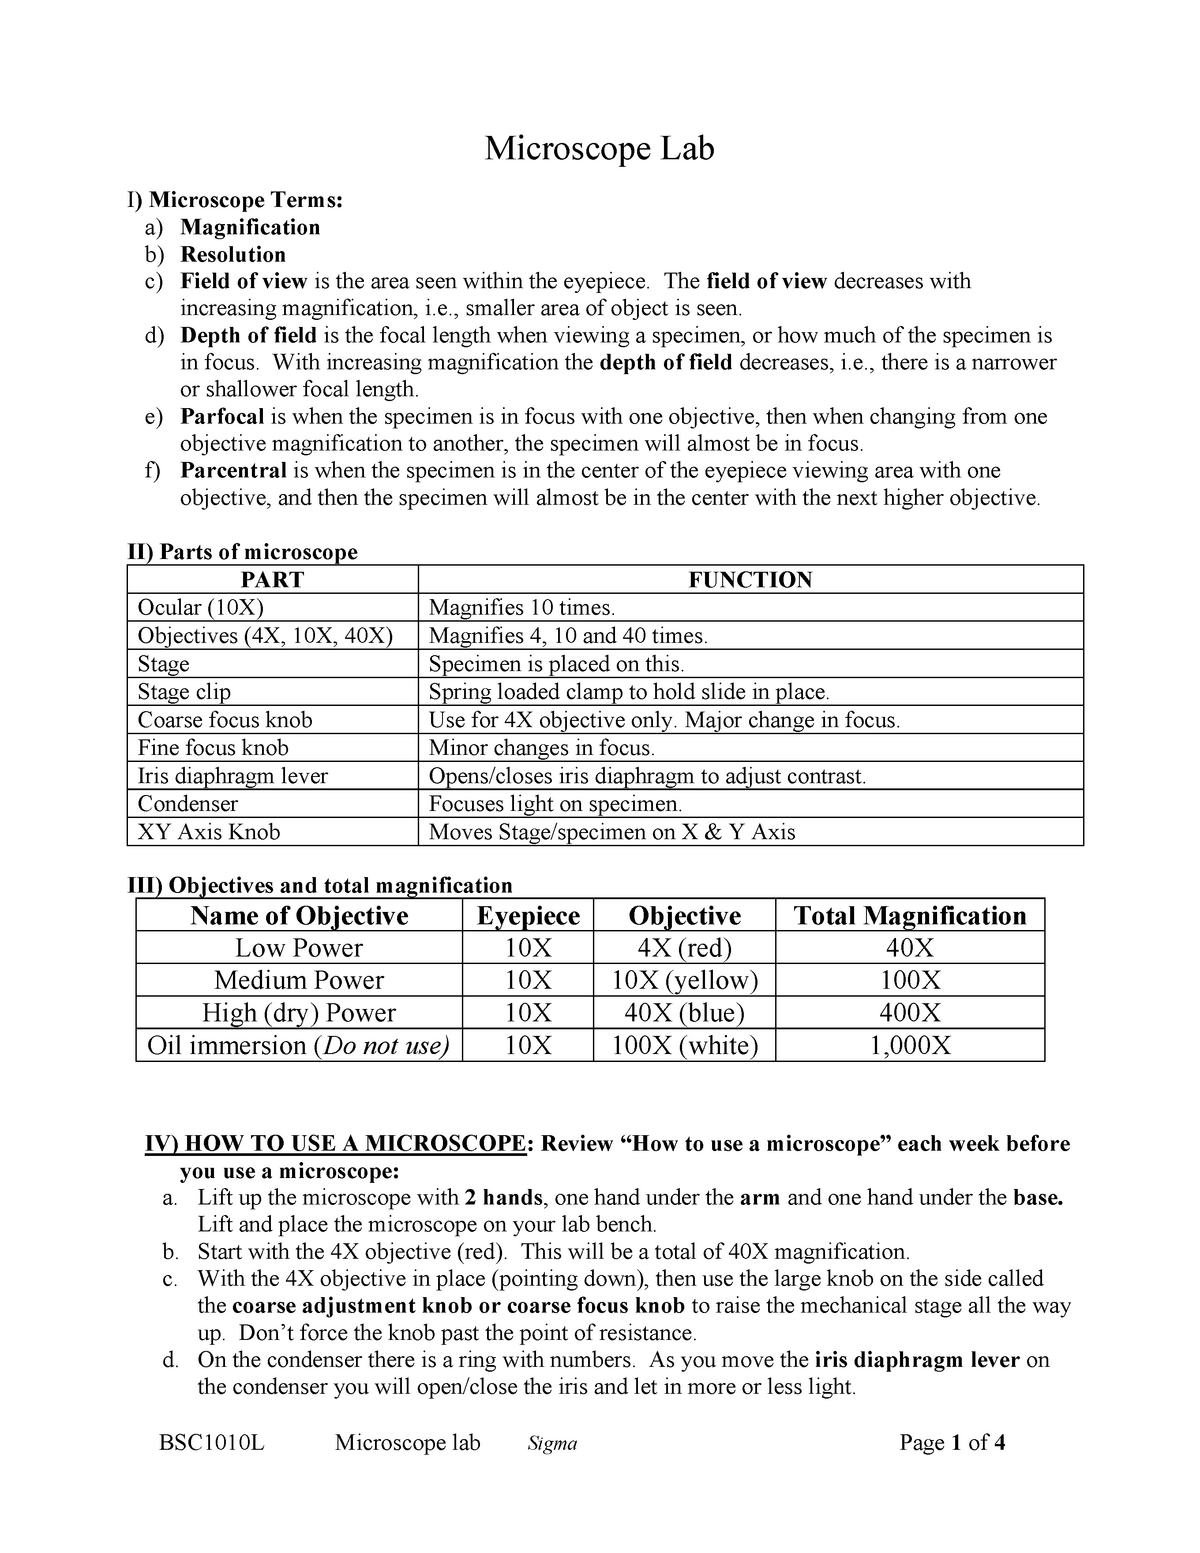 Microscope HO - Summary General Biology I (For Science